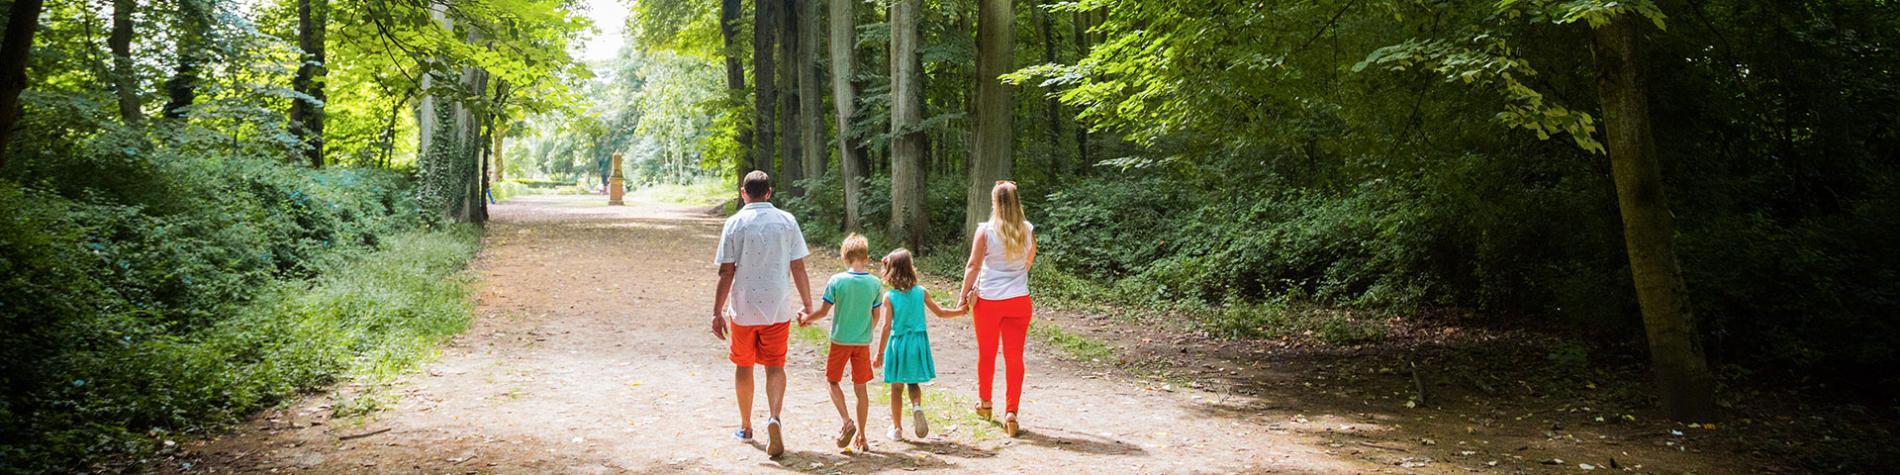 balades & promenades - thématique printemps - Nivelles - parc de la Dodaine